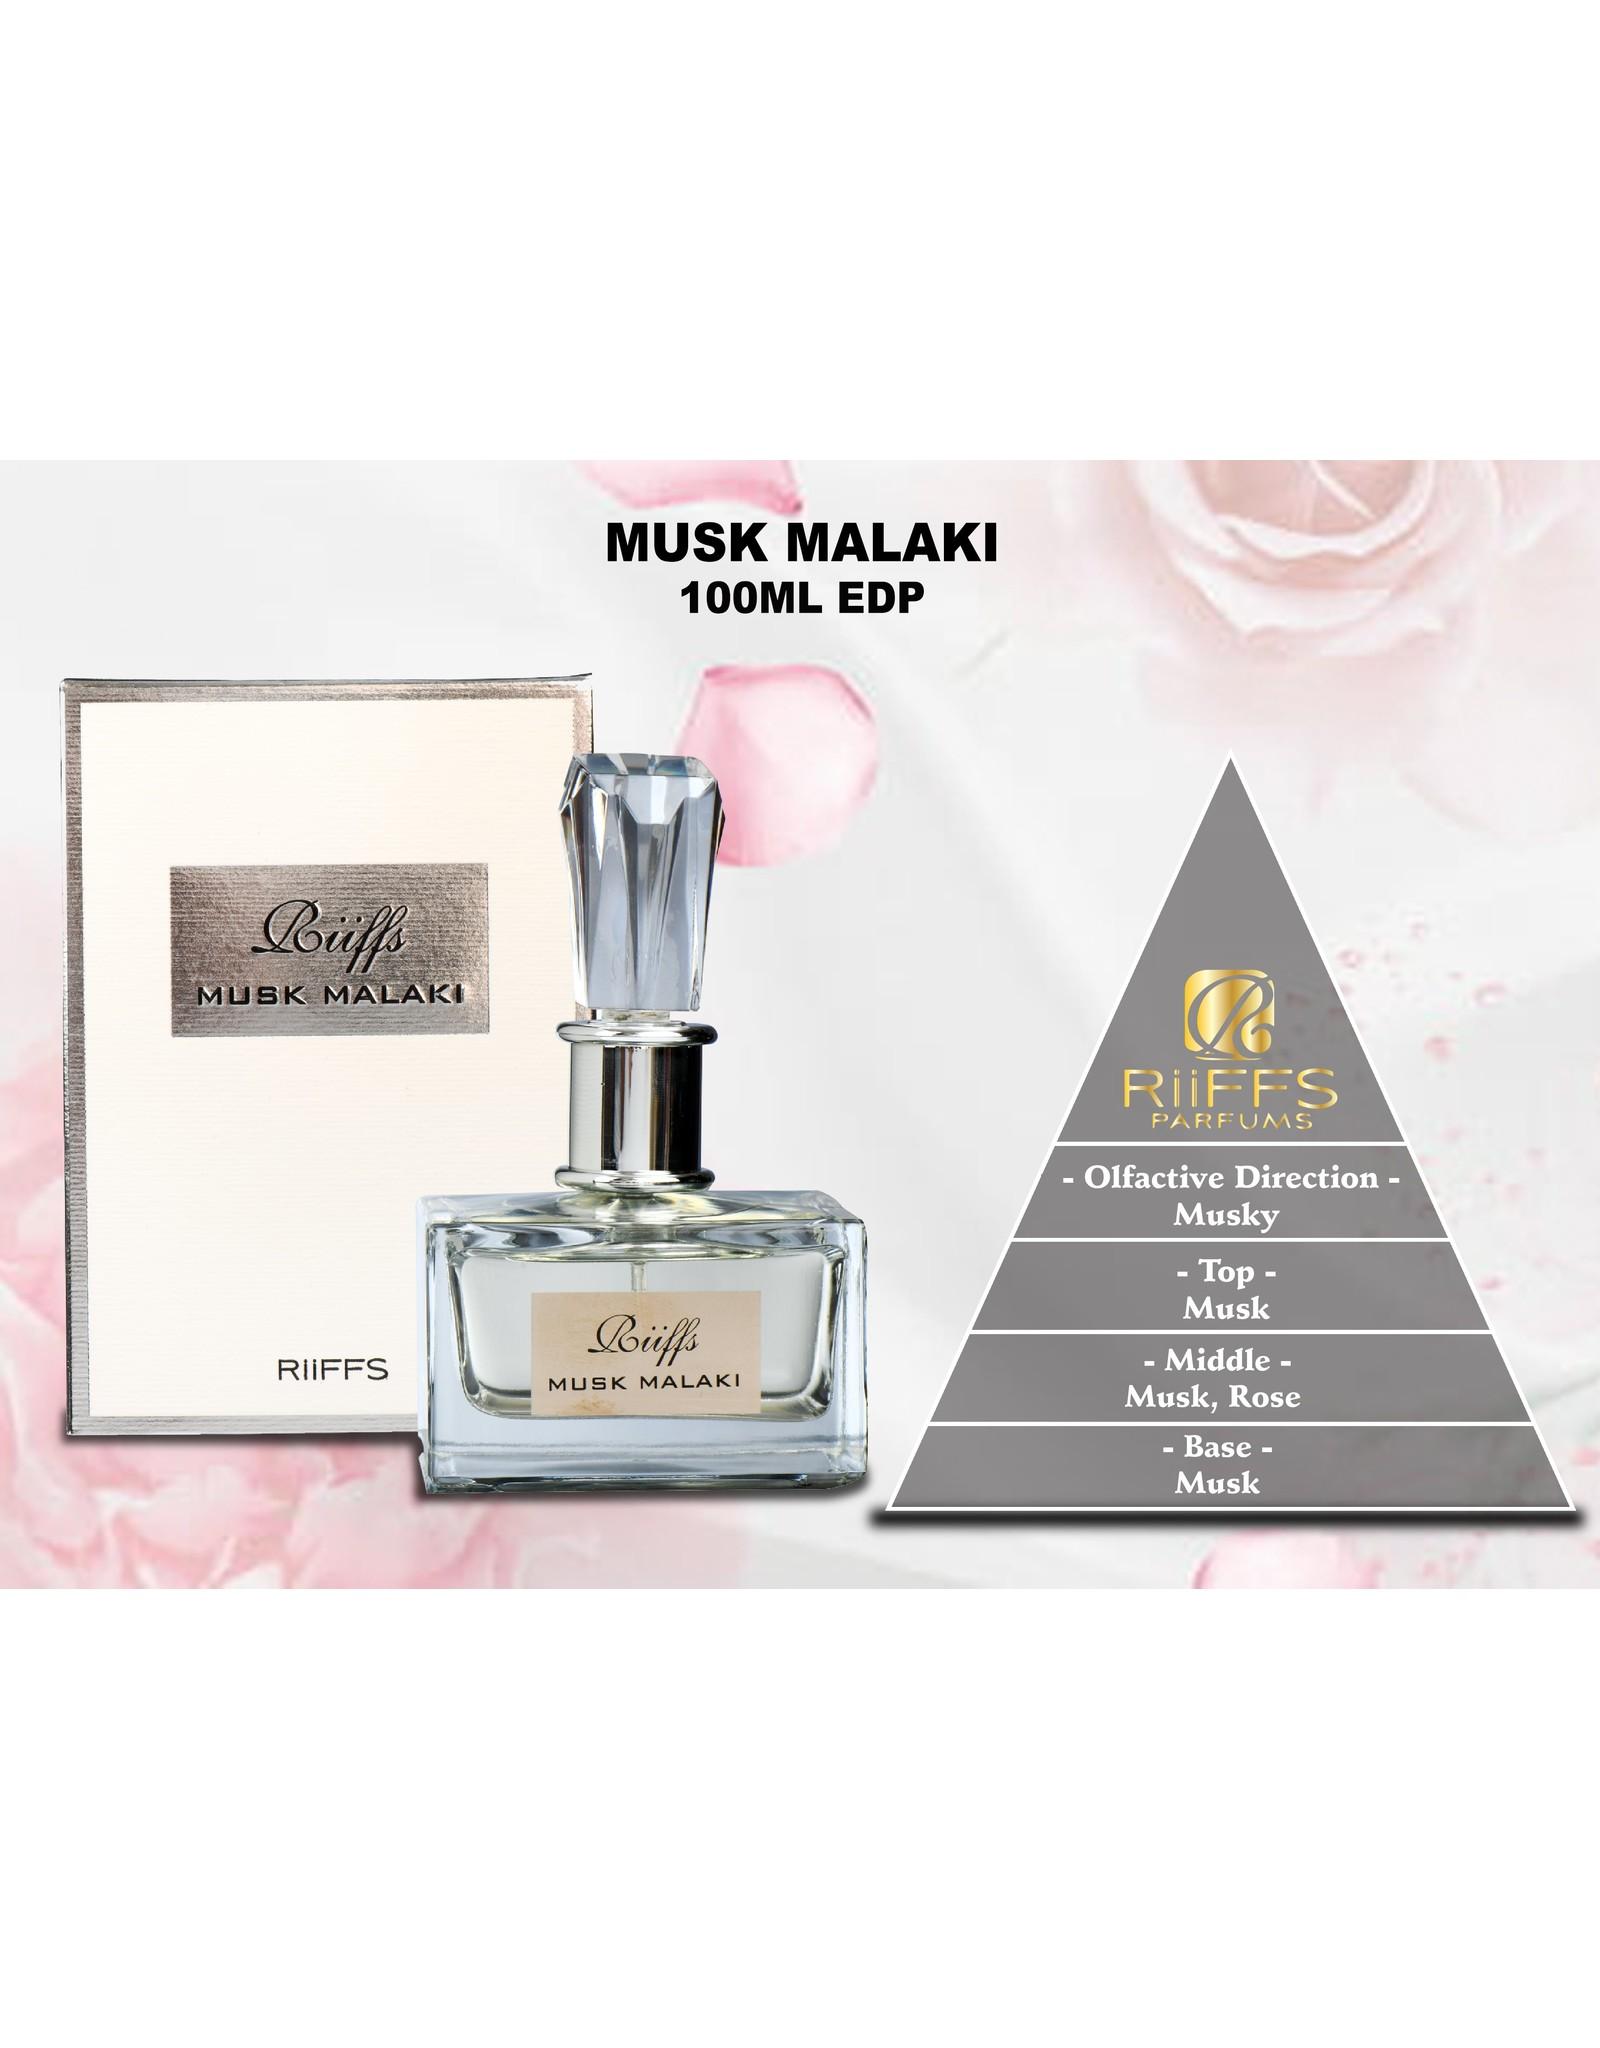 RIFFS Musk Malaki Eau de Parfum 100 ml